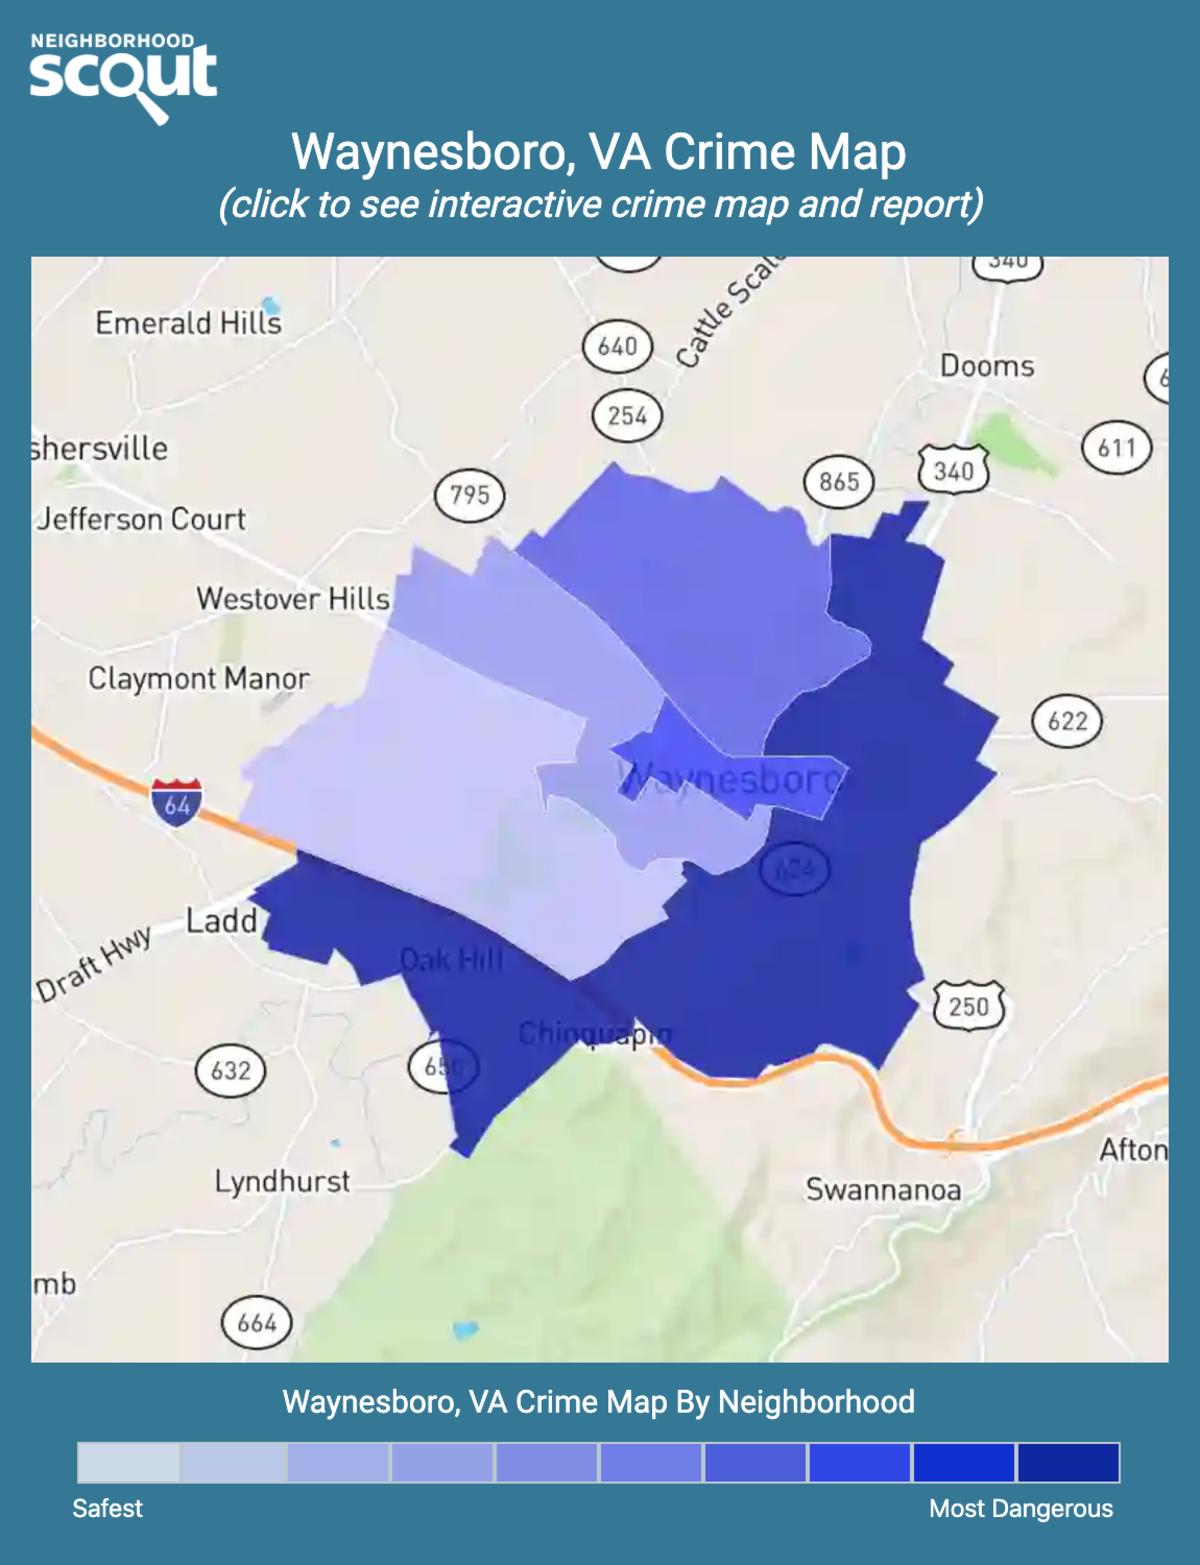 Waynesboro, Virginia crime map